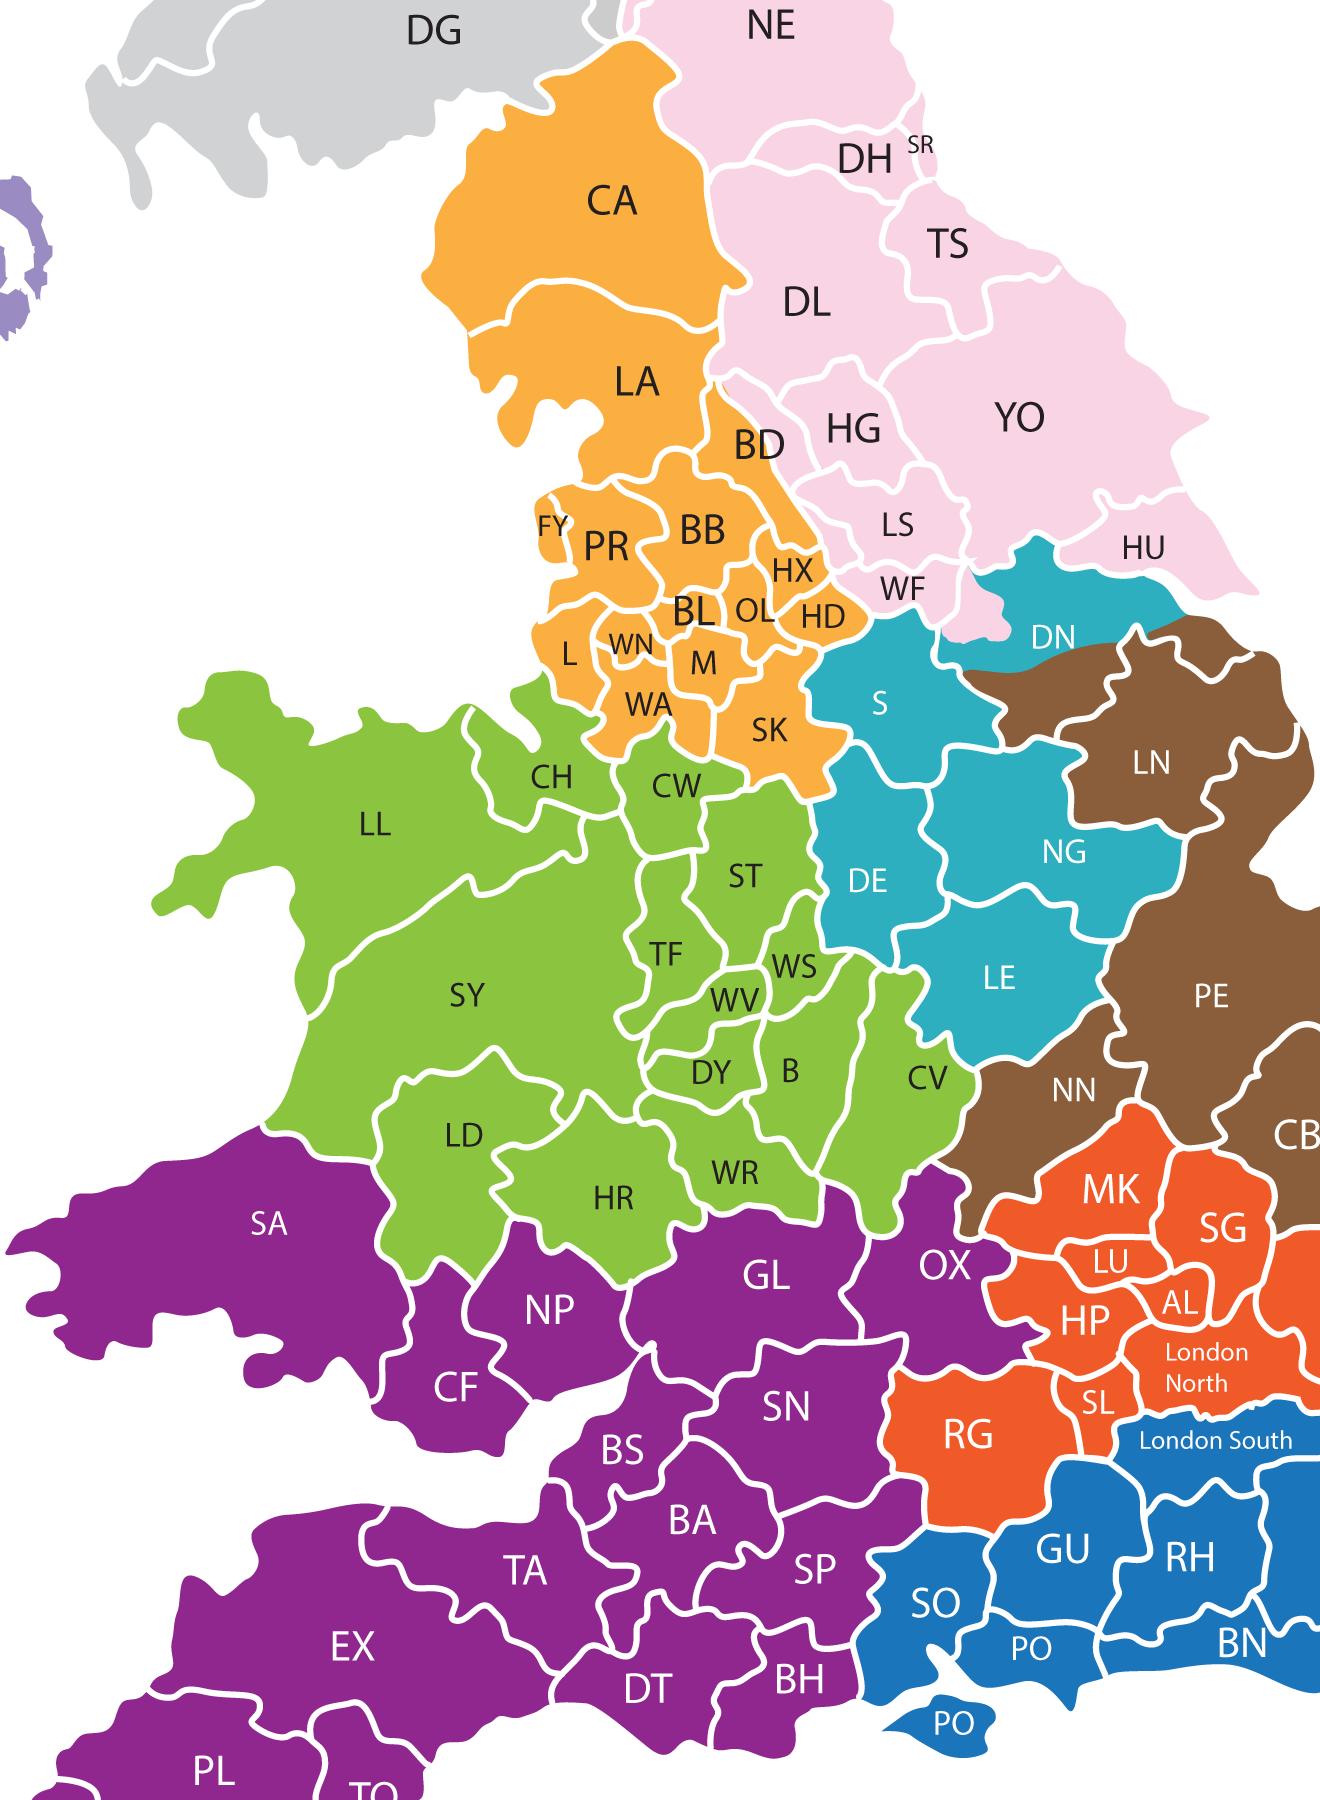 UK location map